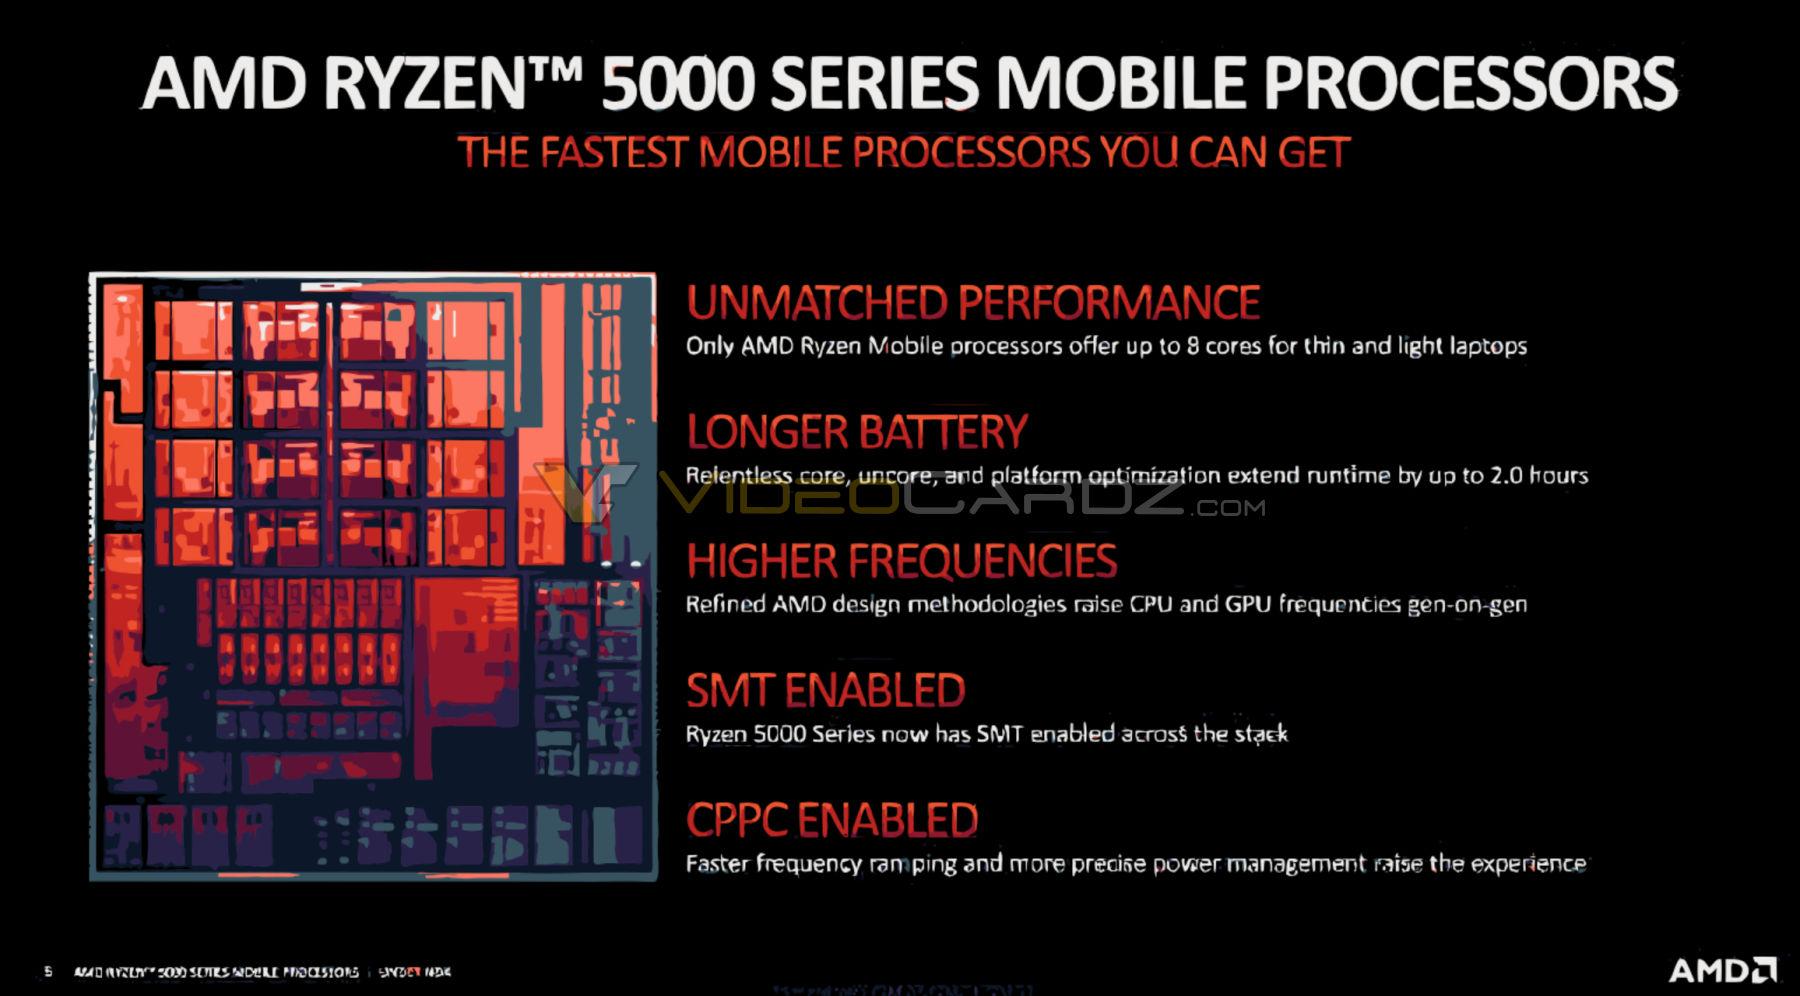 AMD Mengumumkan Zen 3 Based 'Cezanne' Ryzen 5000 Mobility Series Processors